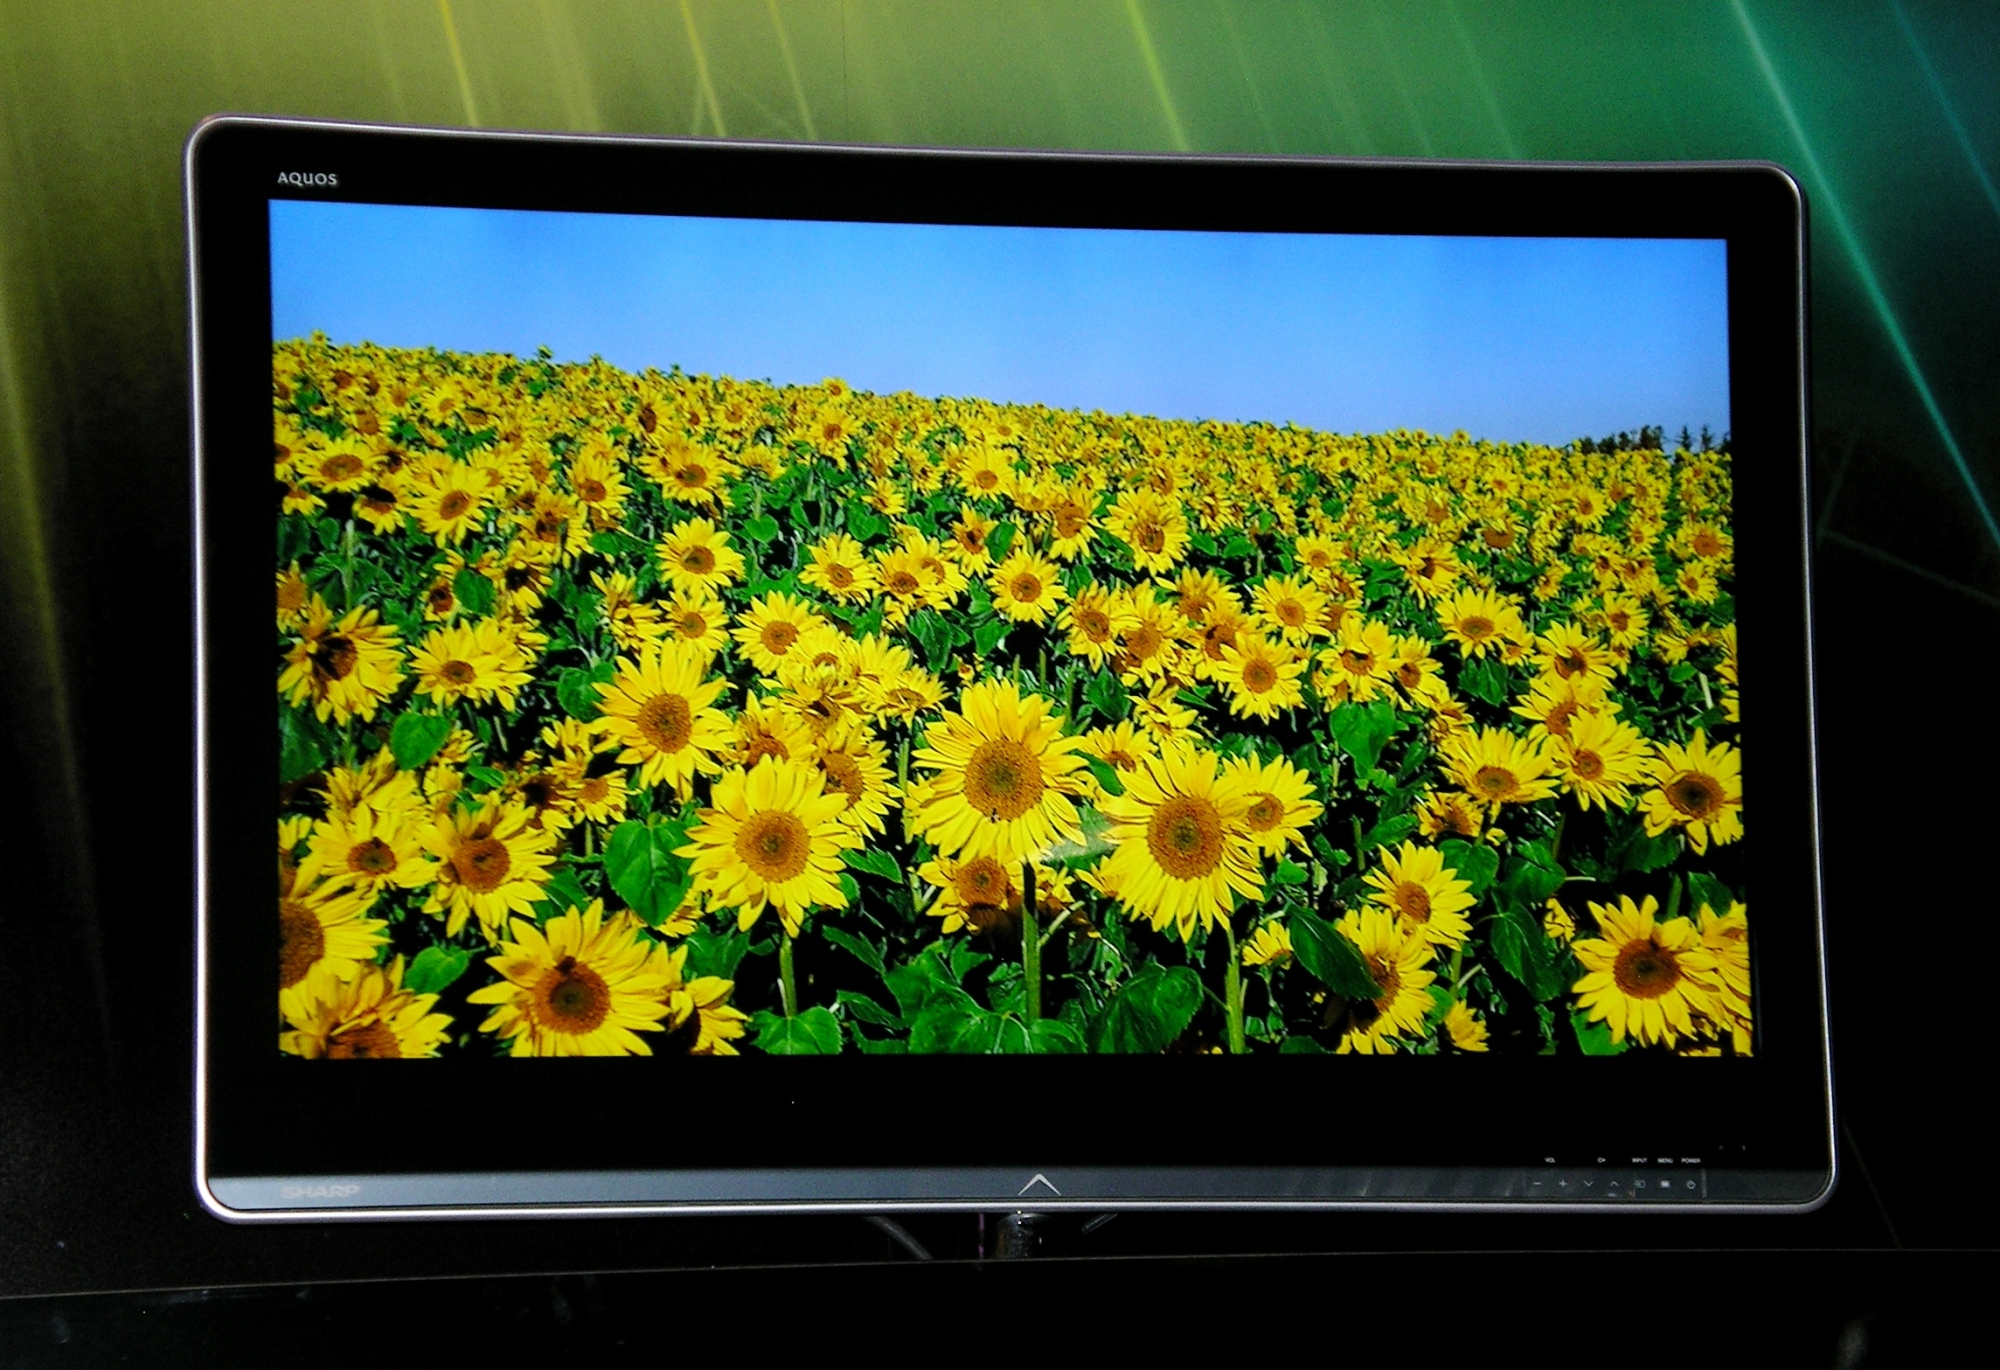 sharp bringt mehr farbe ins flachbild tv heise online. Black Bedroom Furniture Sets. Home Design Ideas